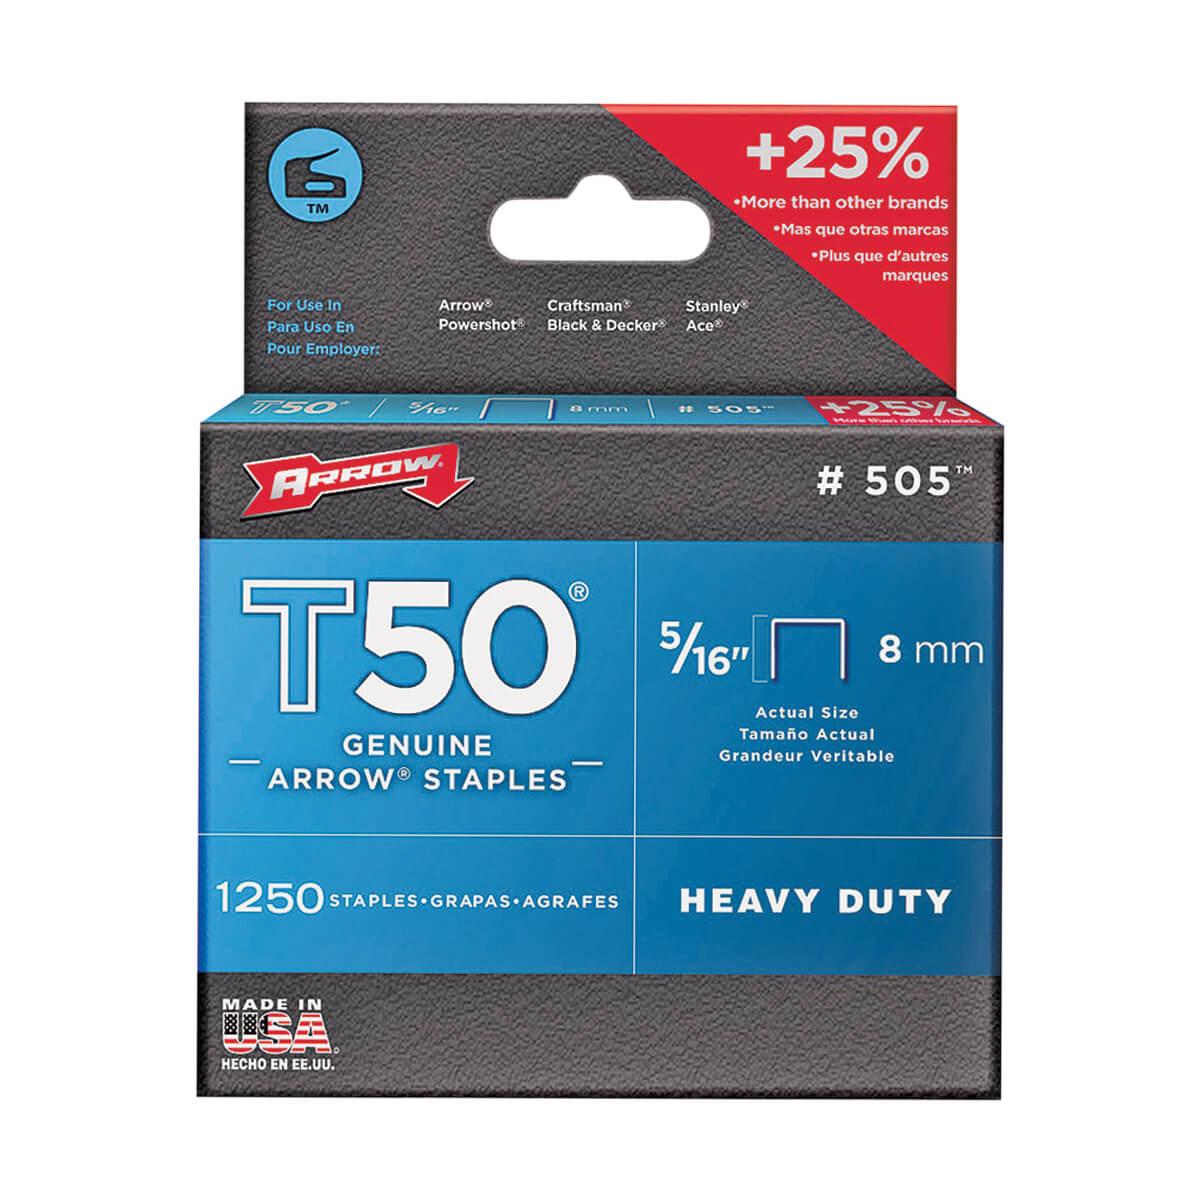 "Heavy Duty Crown Staples, 5/16"" (box of 1250)"